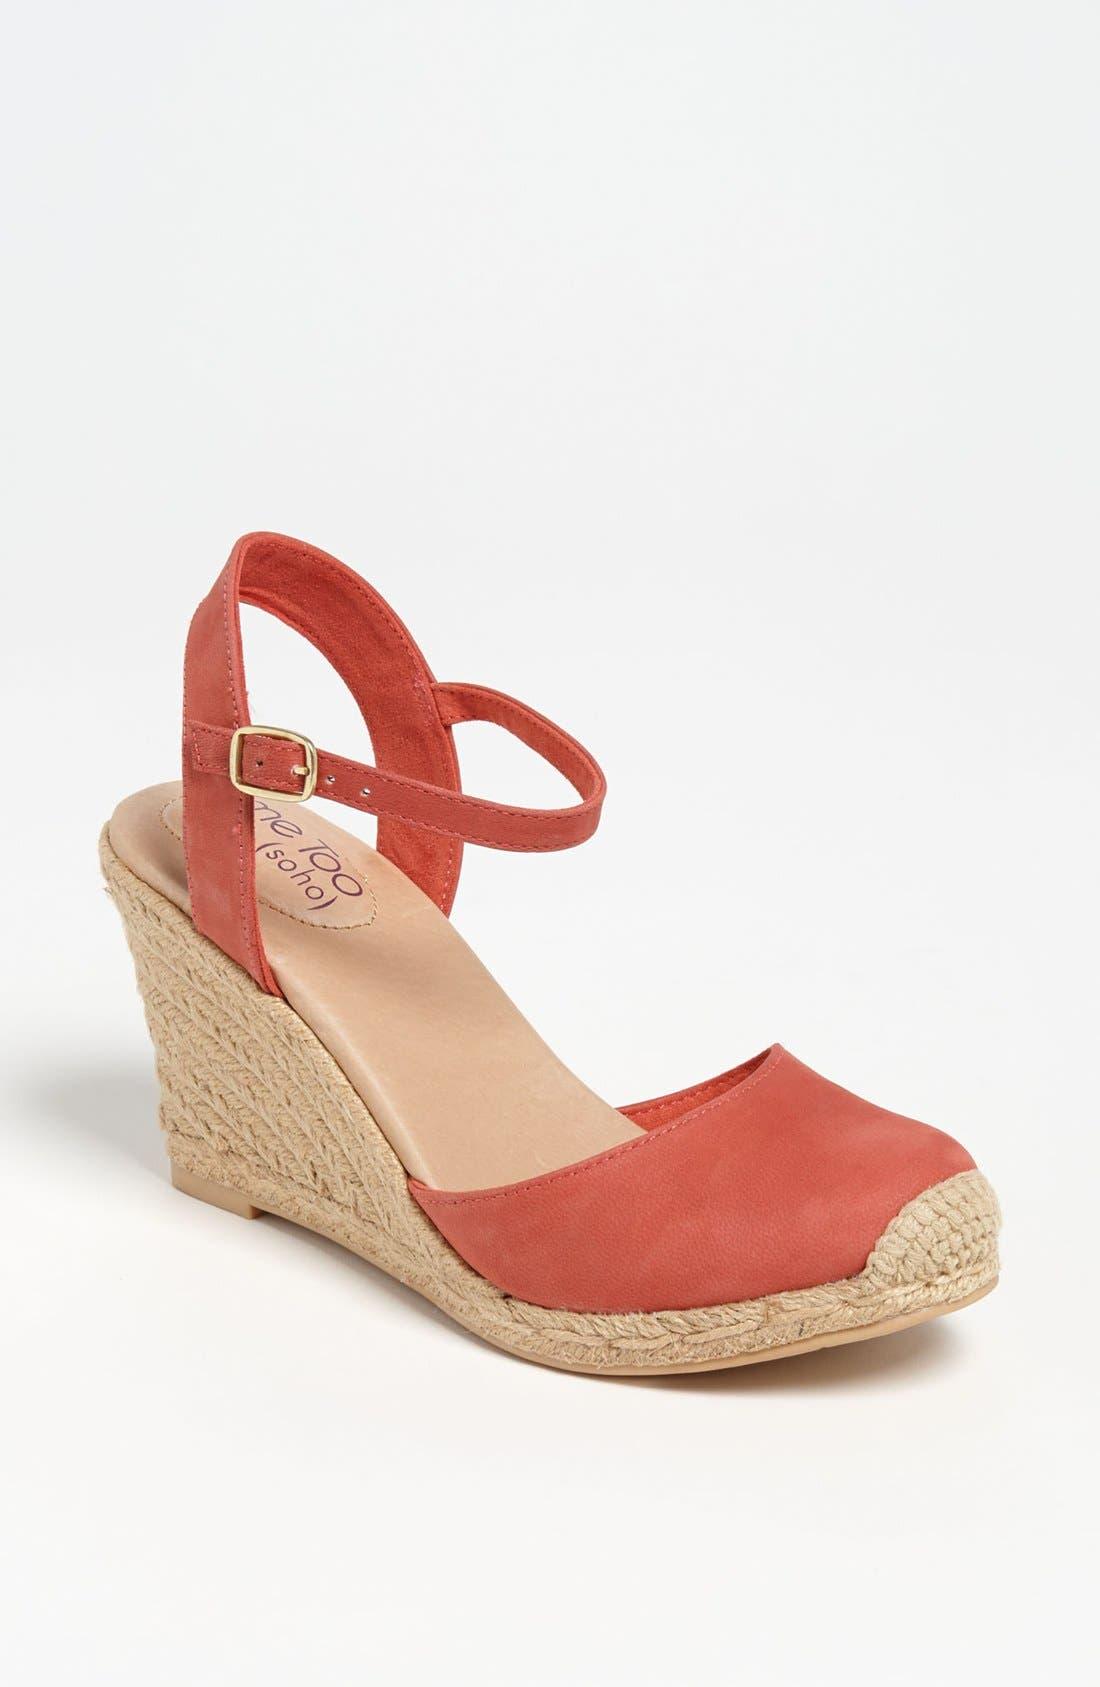 Main Image - Me Too 'Bethany' Wedge Sandal